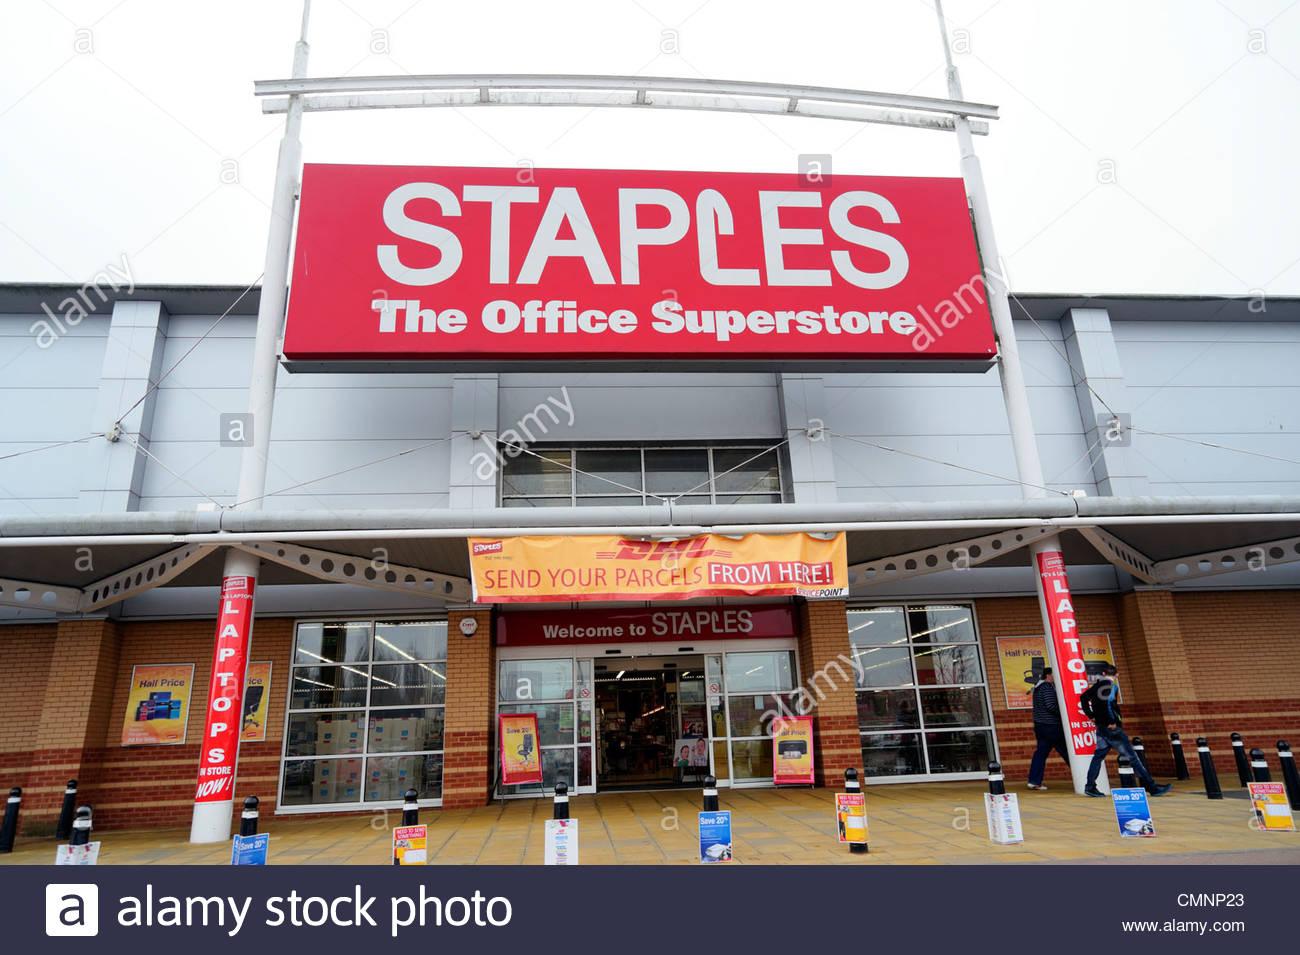 Staples office superstore shop in Kidderminster, UK. - Stock Image